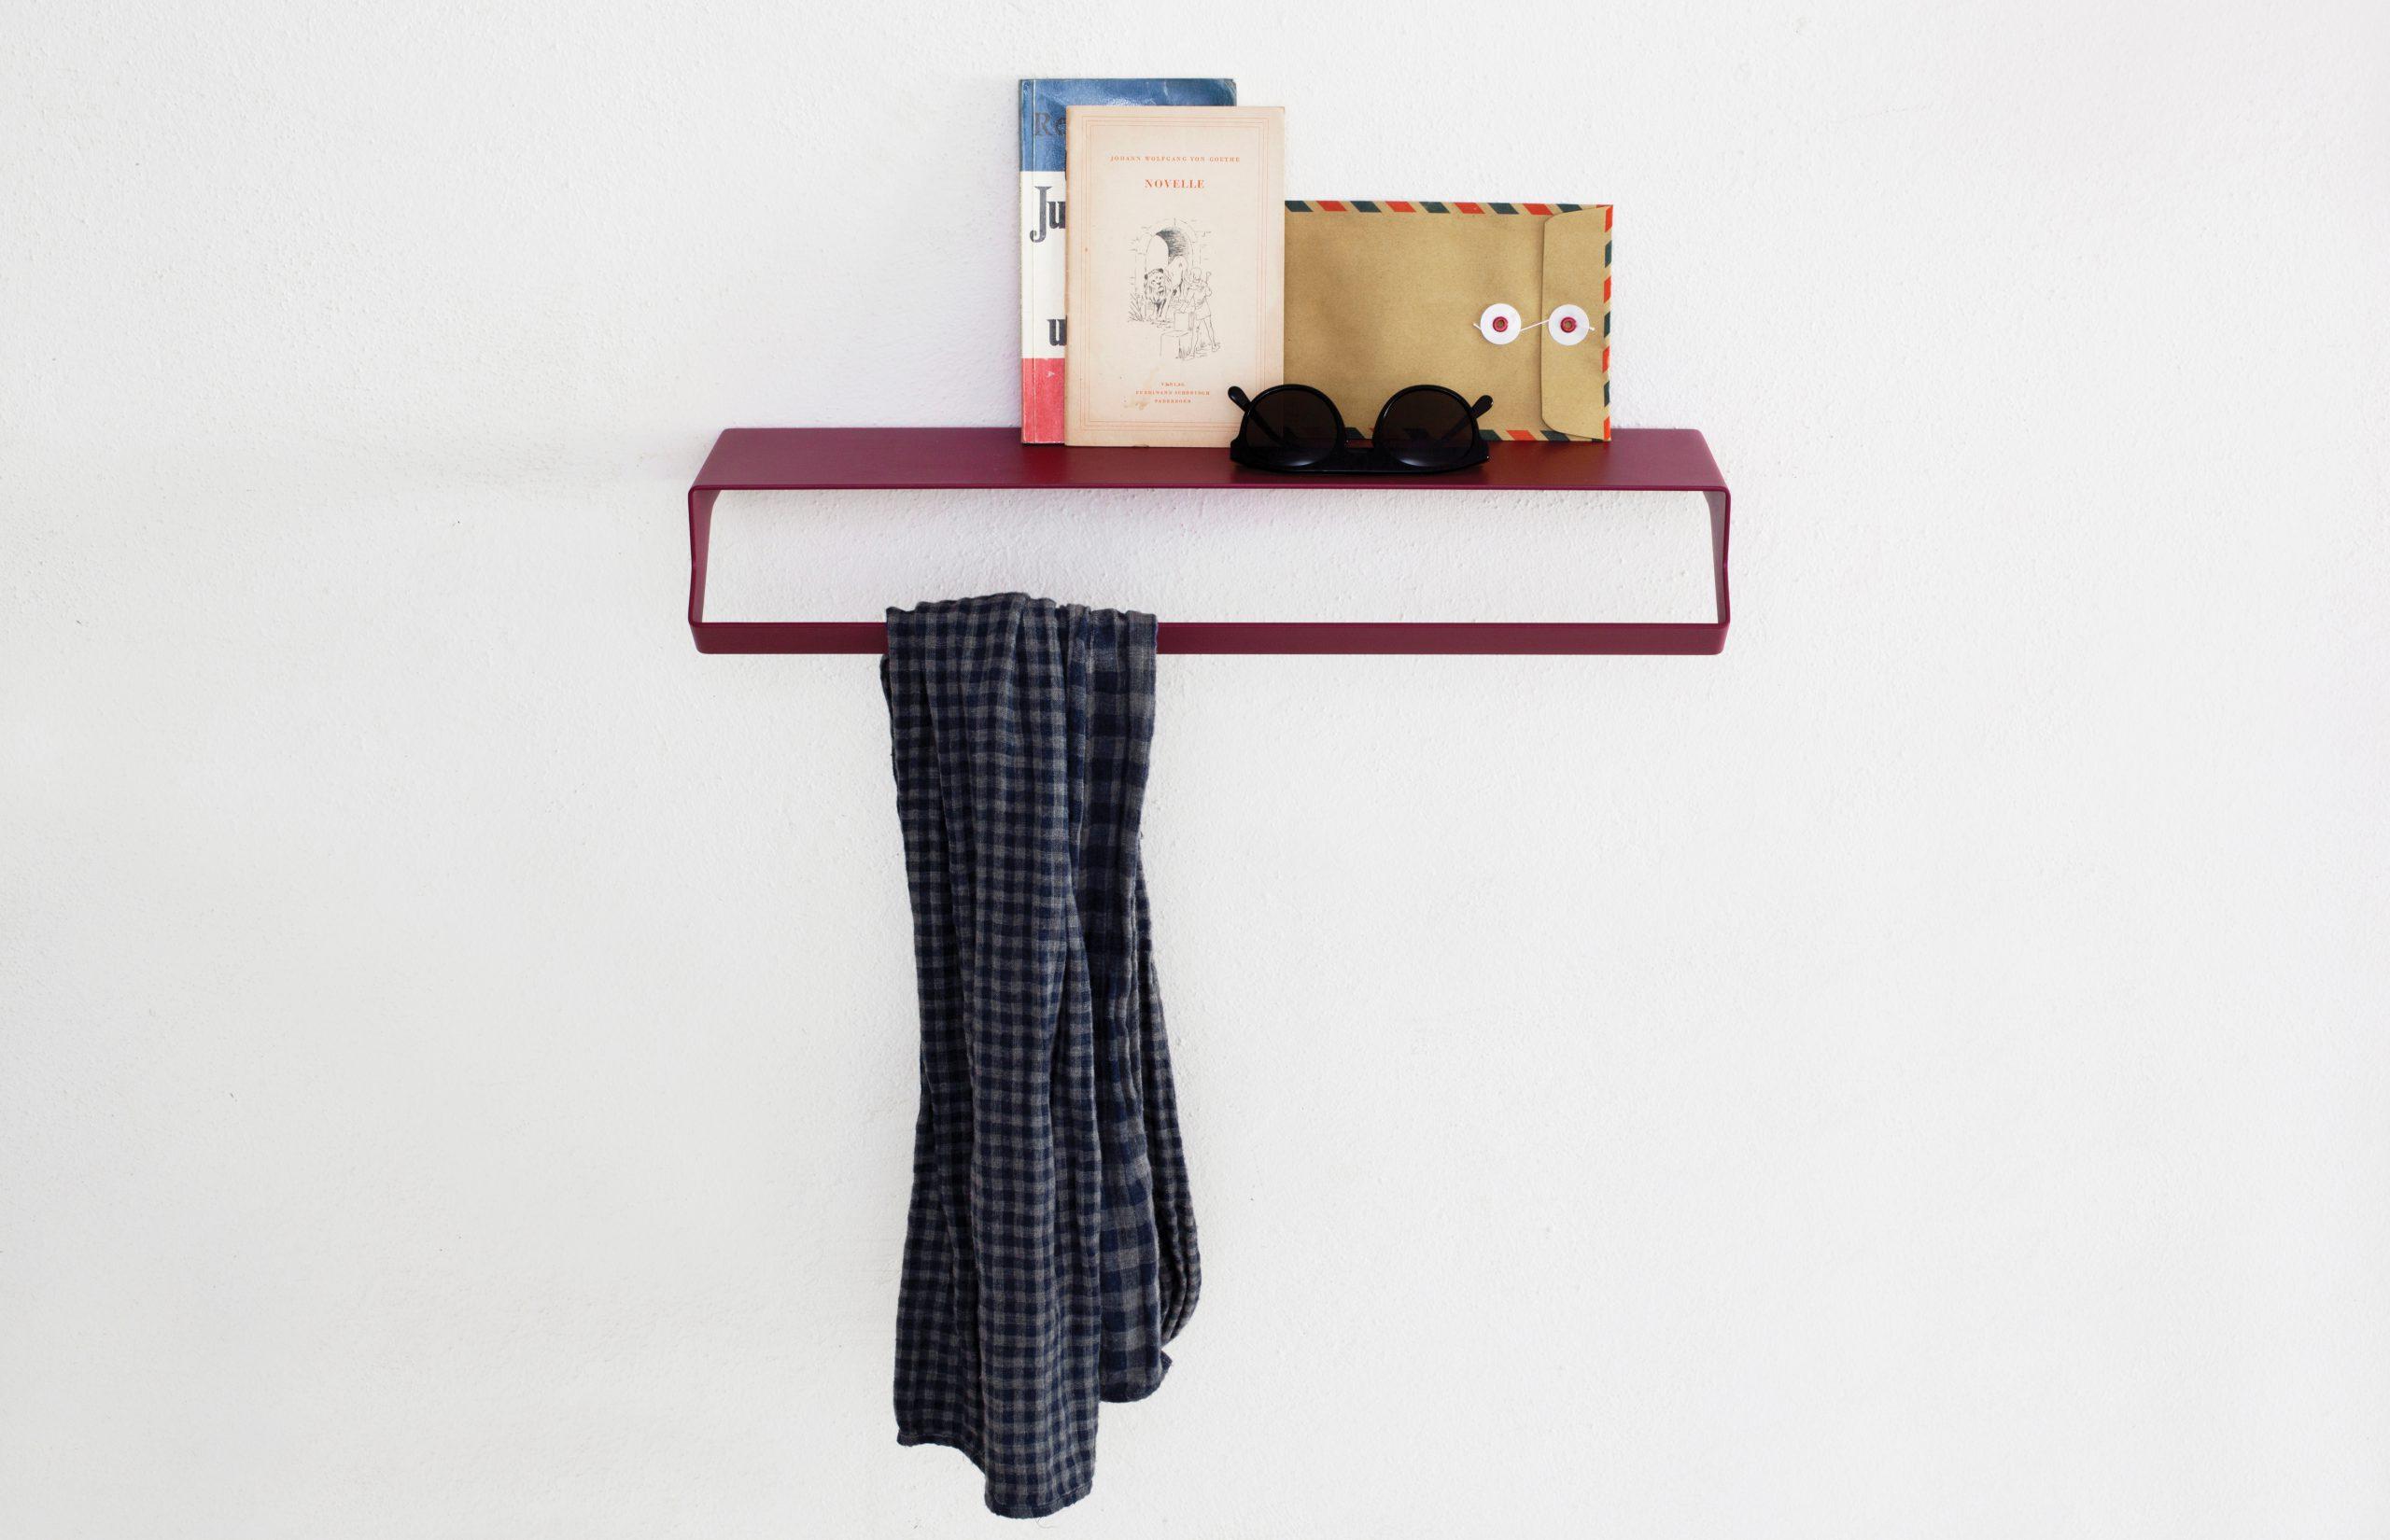 Qgini bathroom accessories by Debiasi Sandri for Antoniolupi